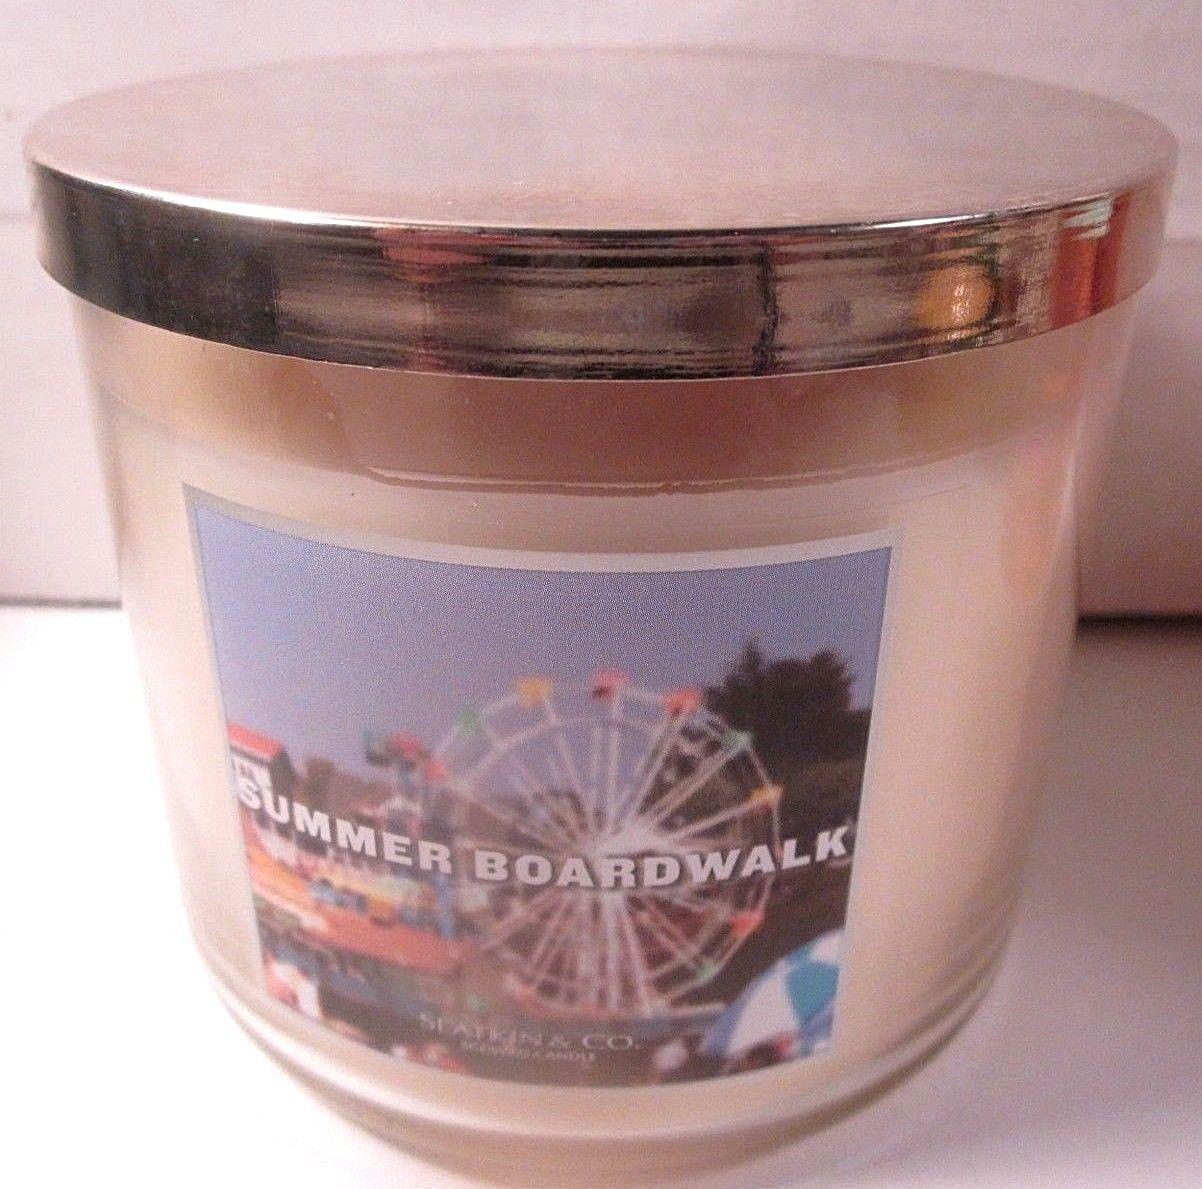 Bath & Body Works 3 wick 14.5 oz Candle Slatkin Summer Boardwalk image 2